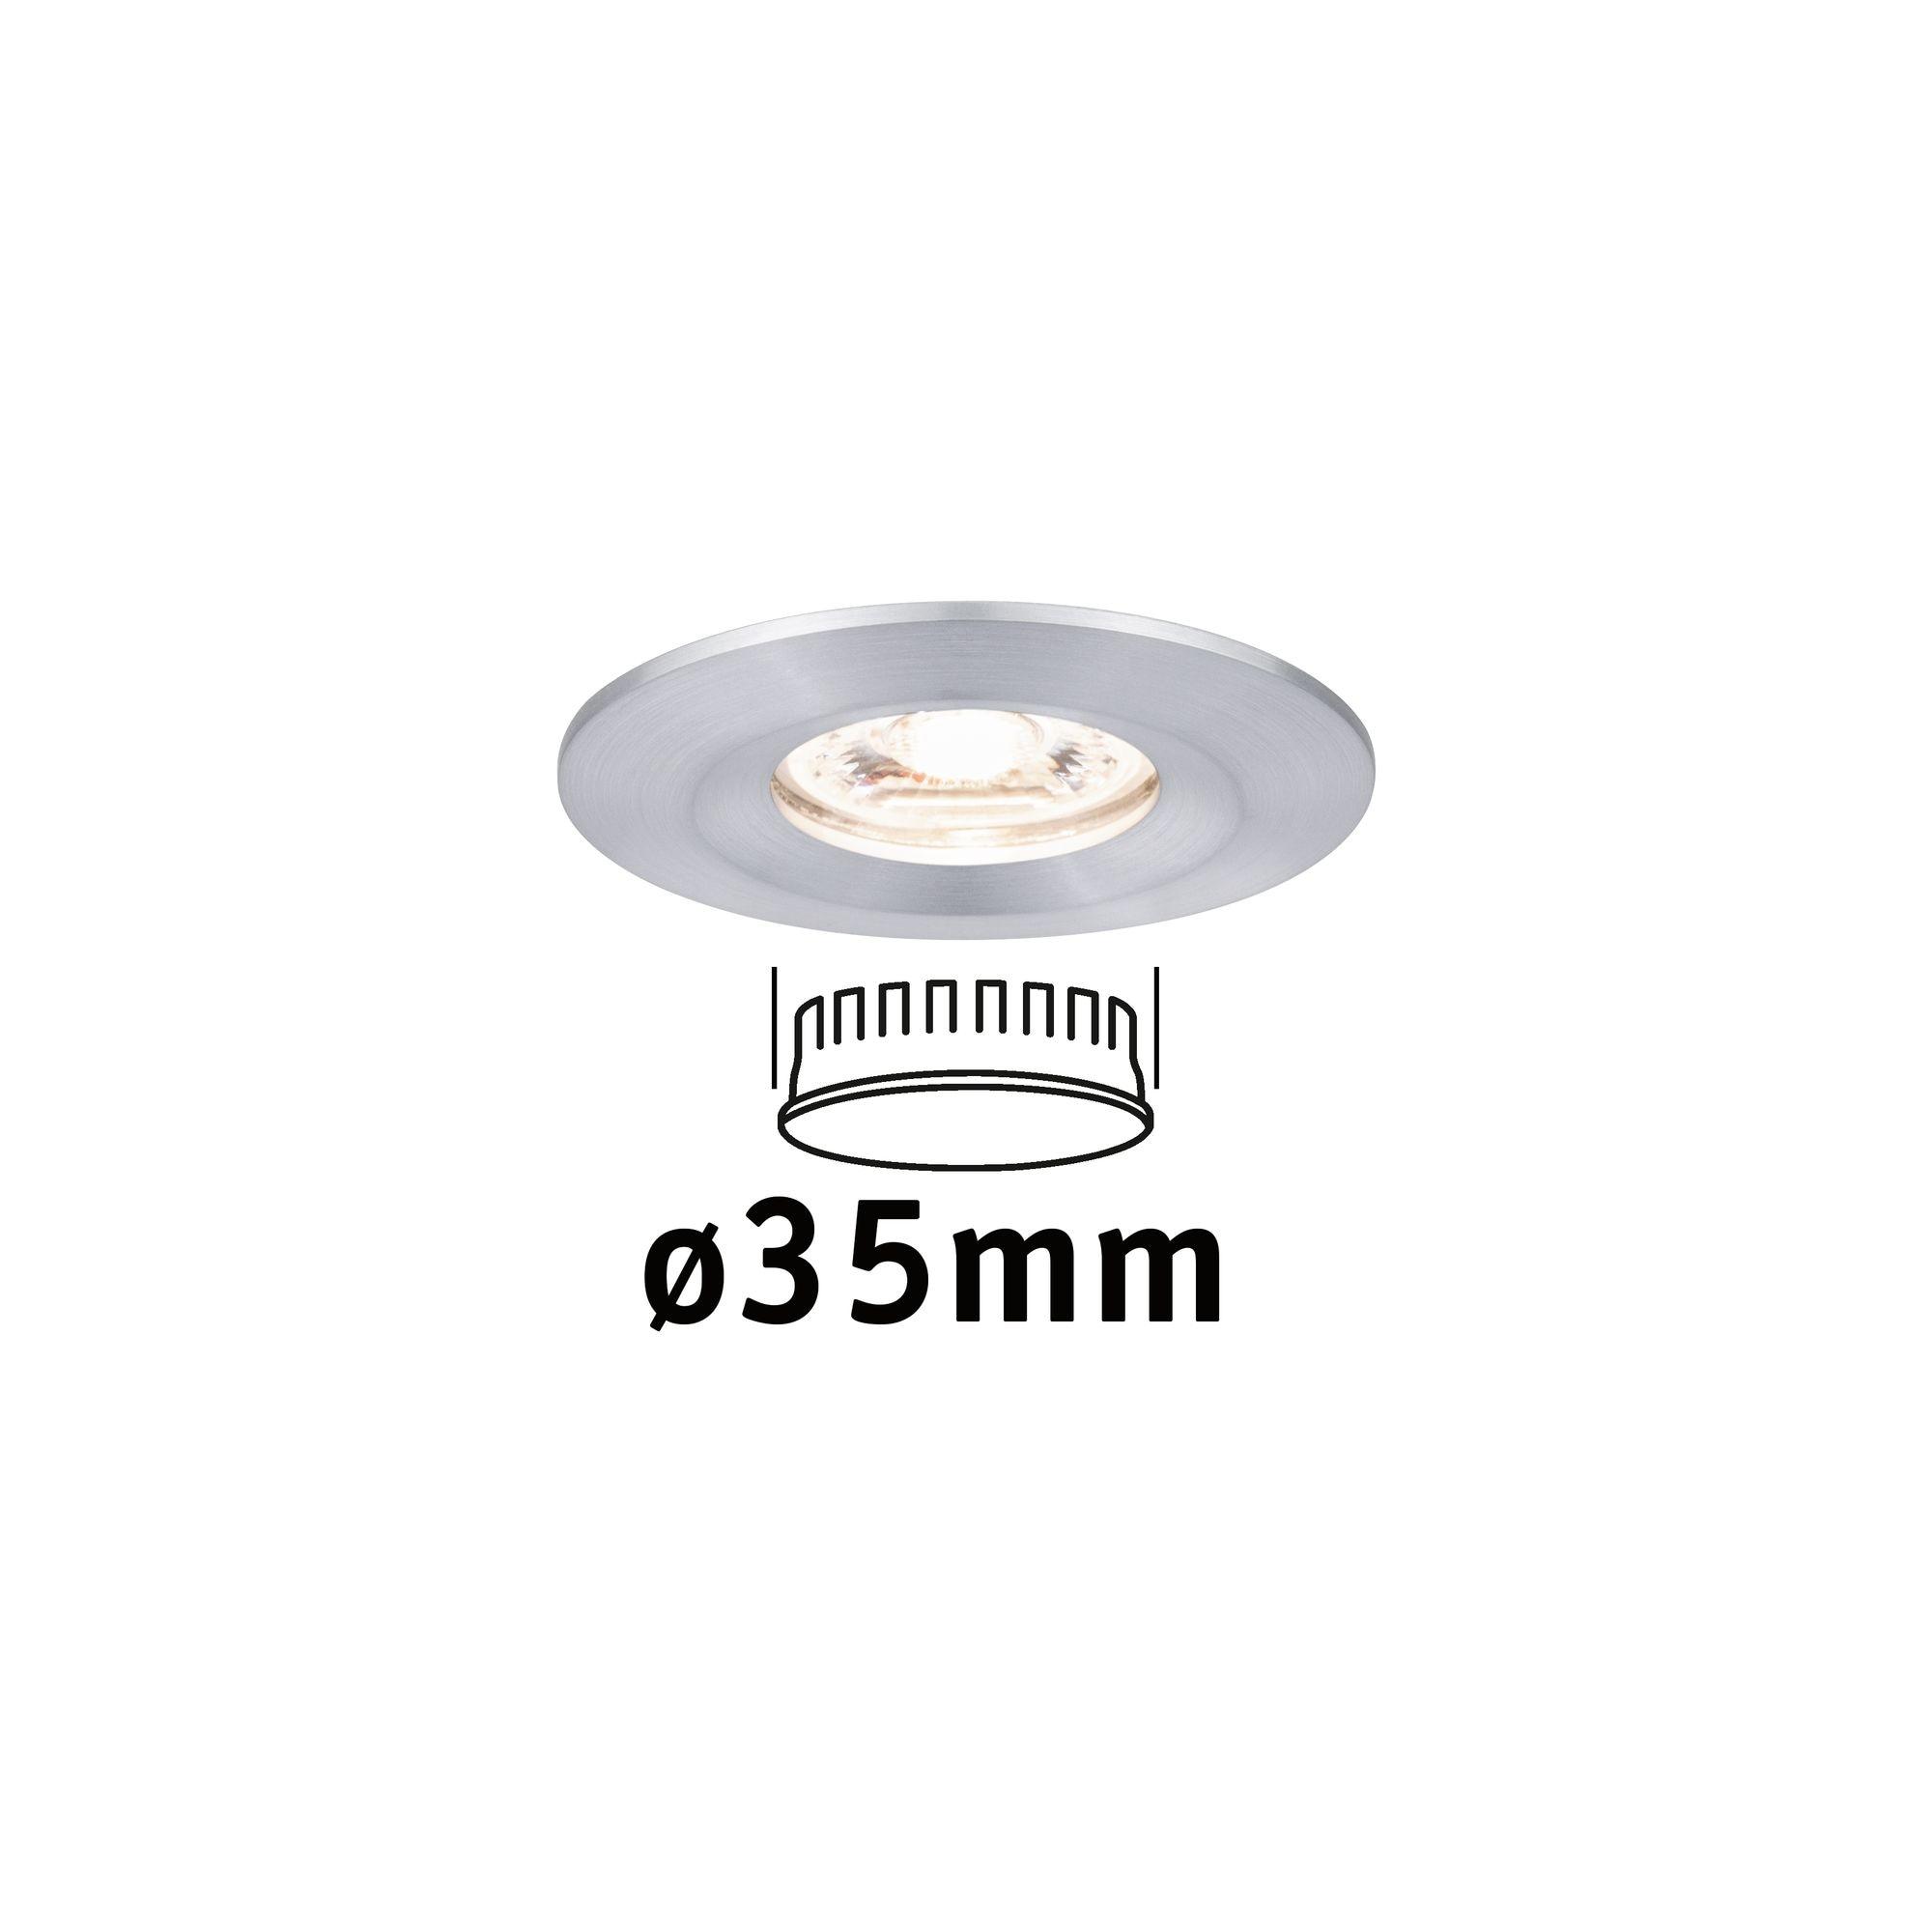 Paulmann LED Einbaustrahler Nova mini starr IP44 1x4W 2.700K Alu gedreht 230V, 1 St., Warmweiß